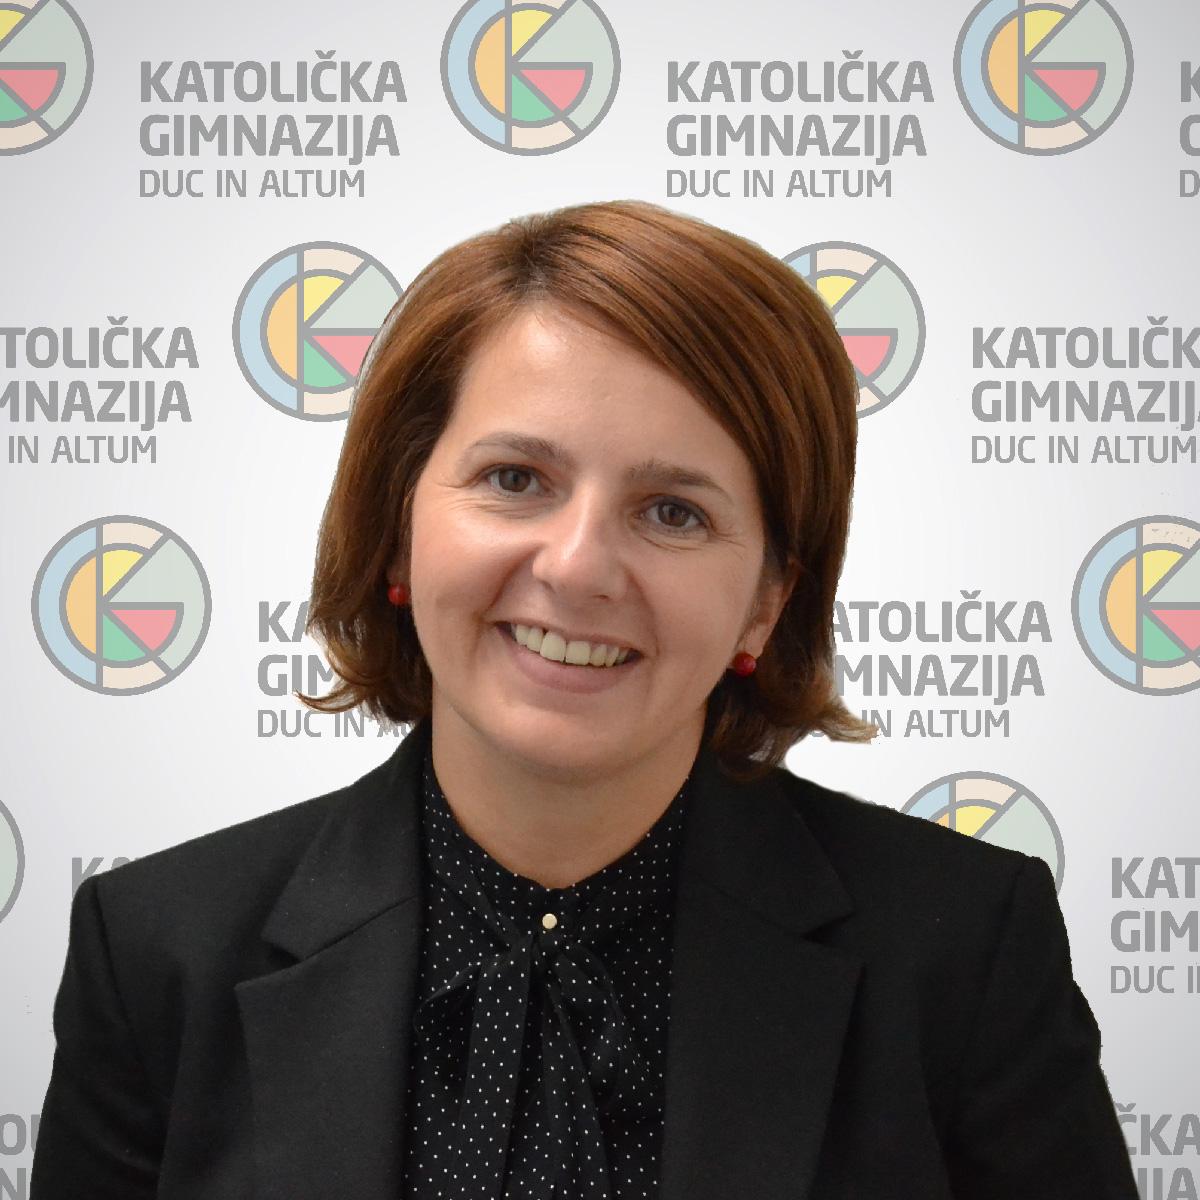 Marijana Ćorluka